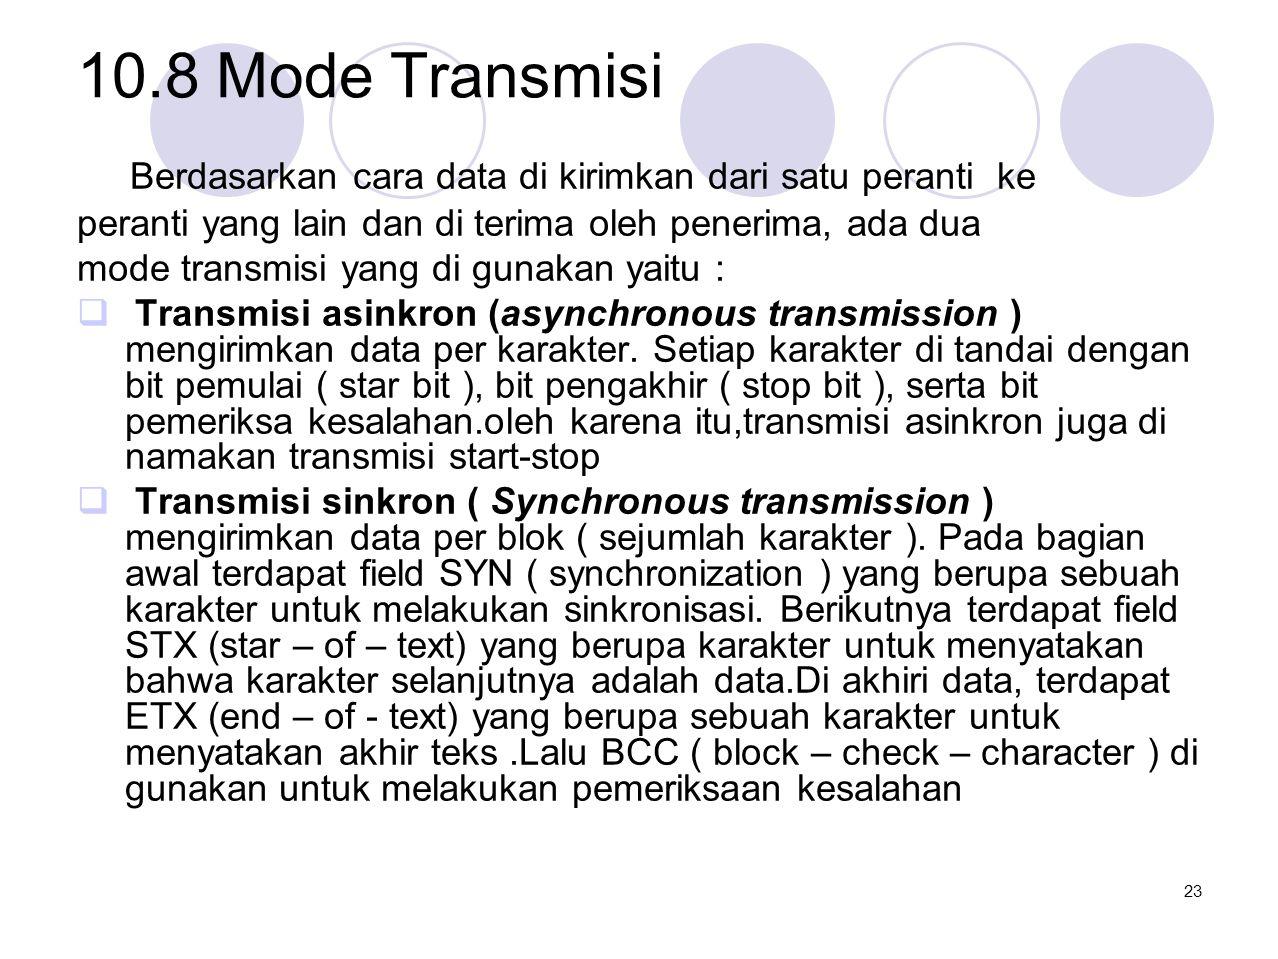 10.8 Mode Transmisi Berdasarkan cara data di kirimkan dari satu peranti ke peranti yang lain dan di terima oleh penerima, ada dua mode transmisi yang